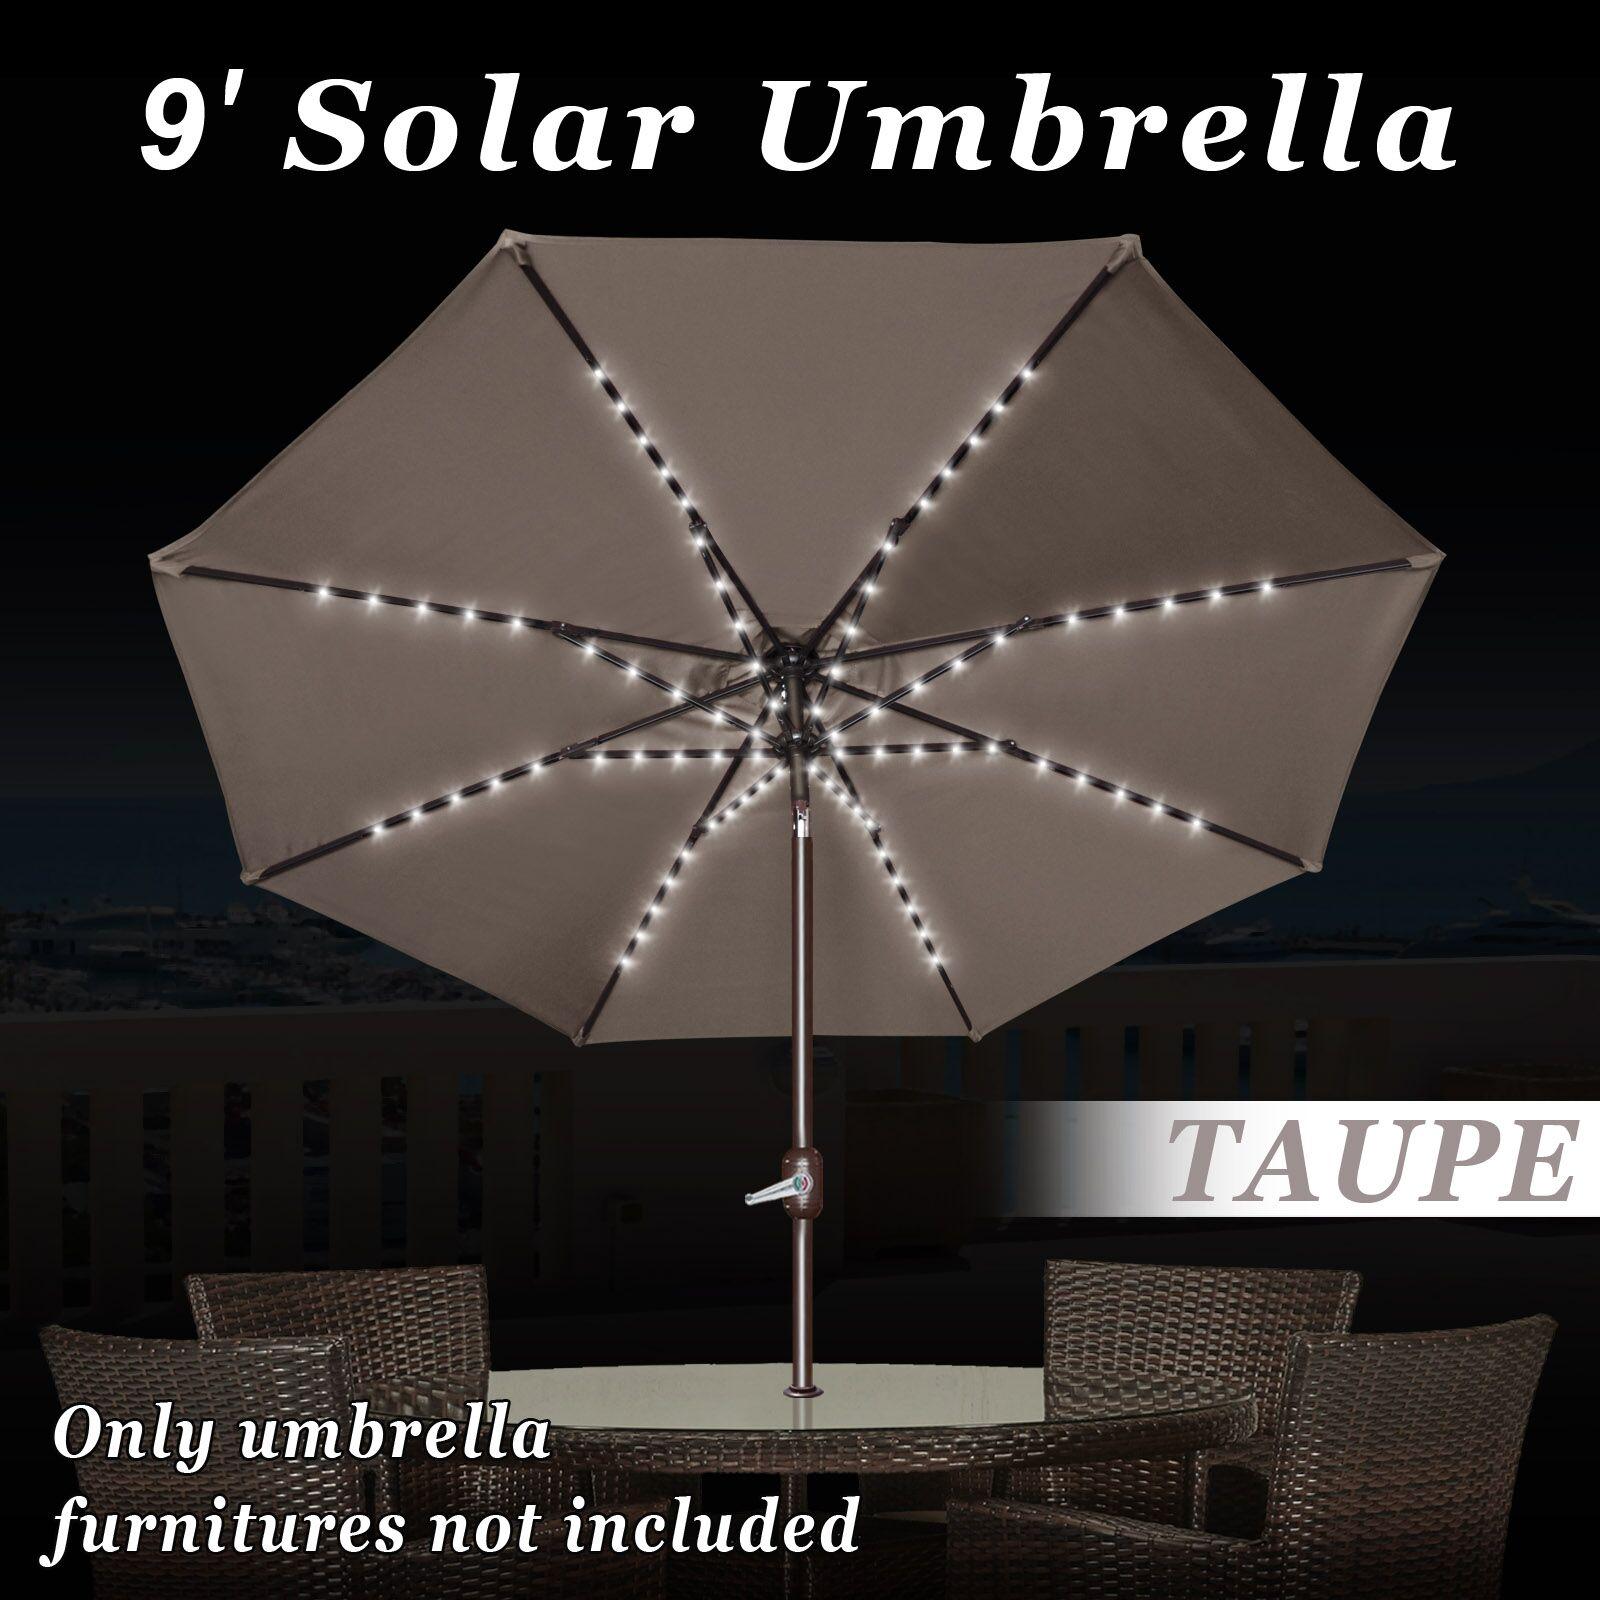 Battista 9' Market Umbrella with LED Light Fabric Color: TAUPE